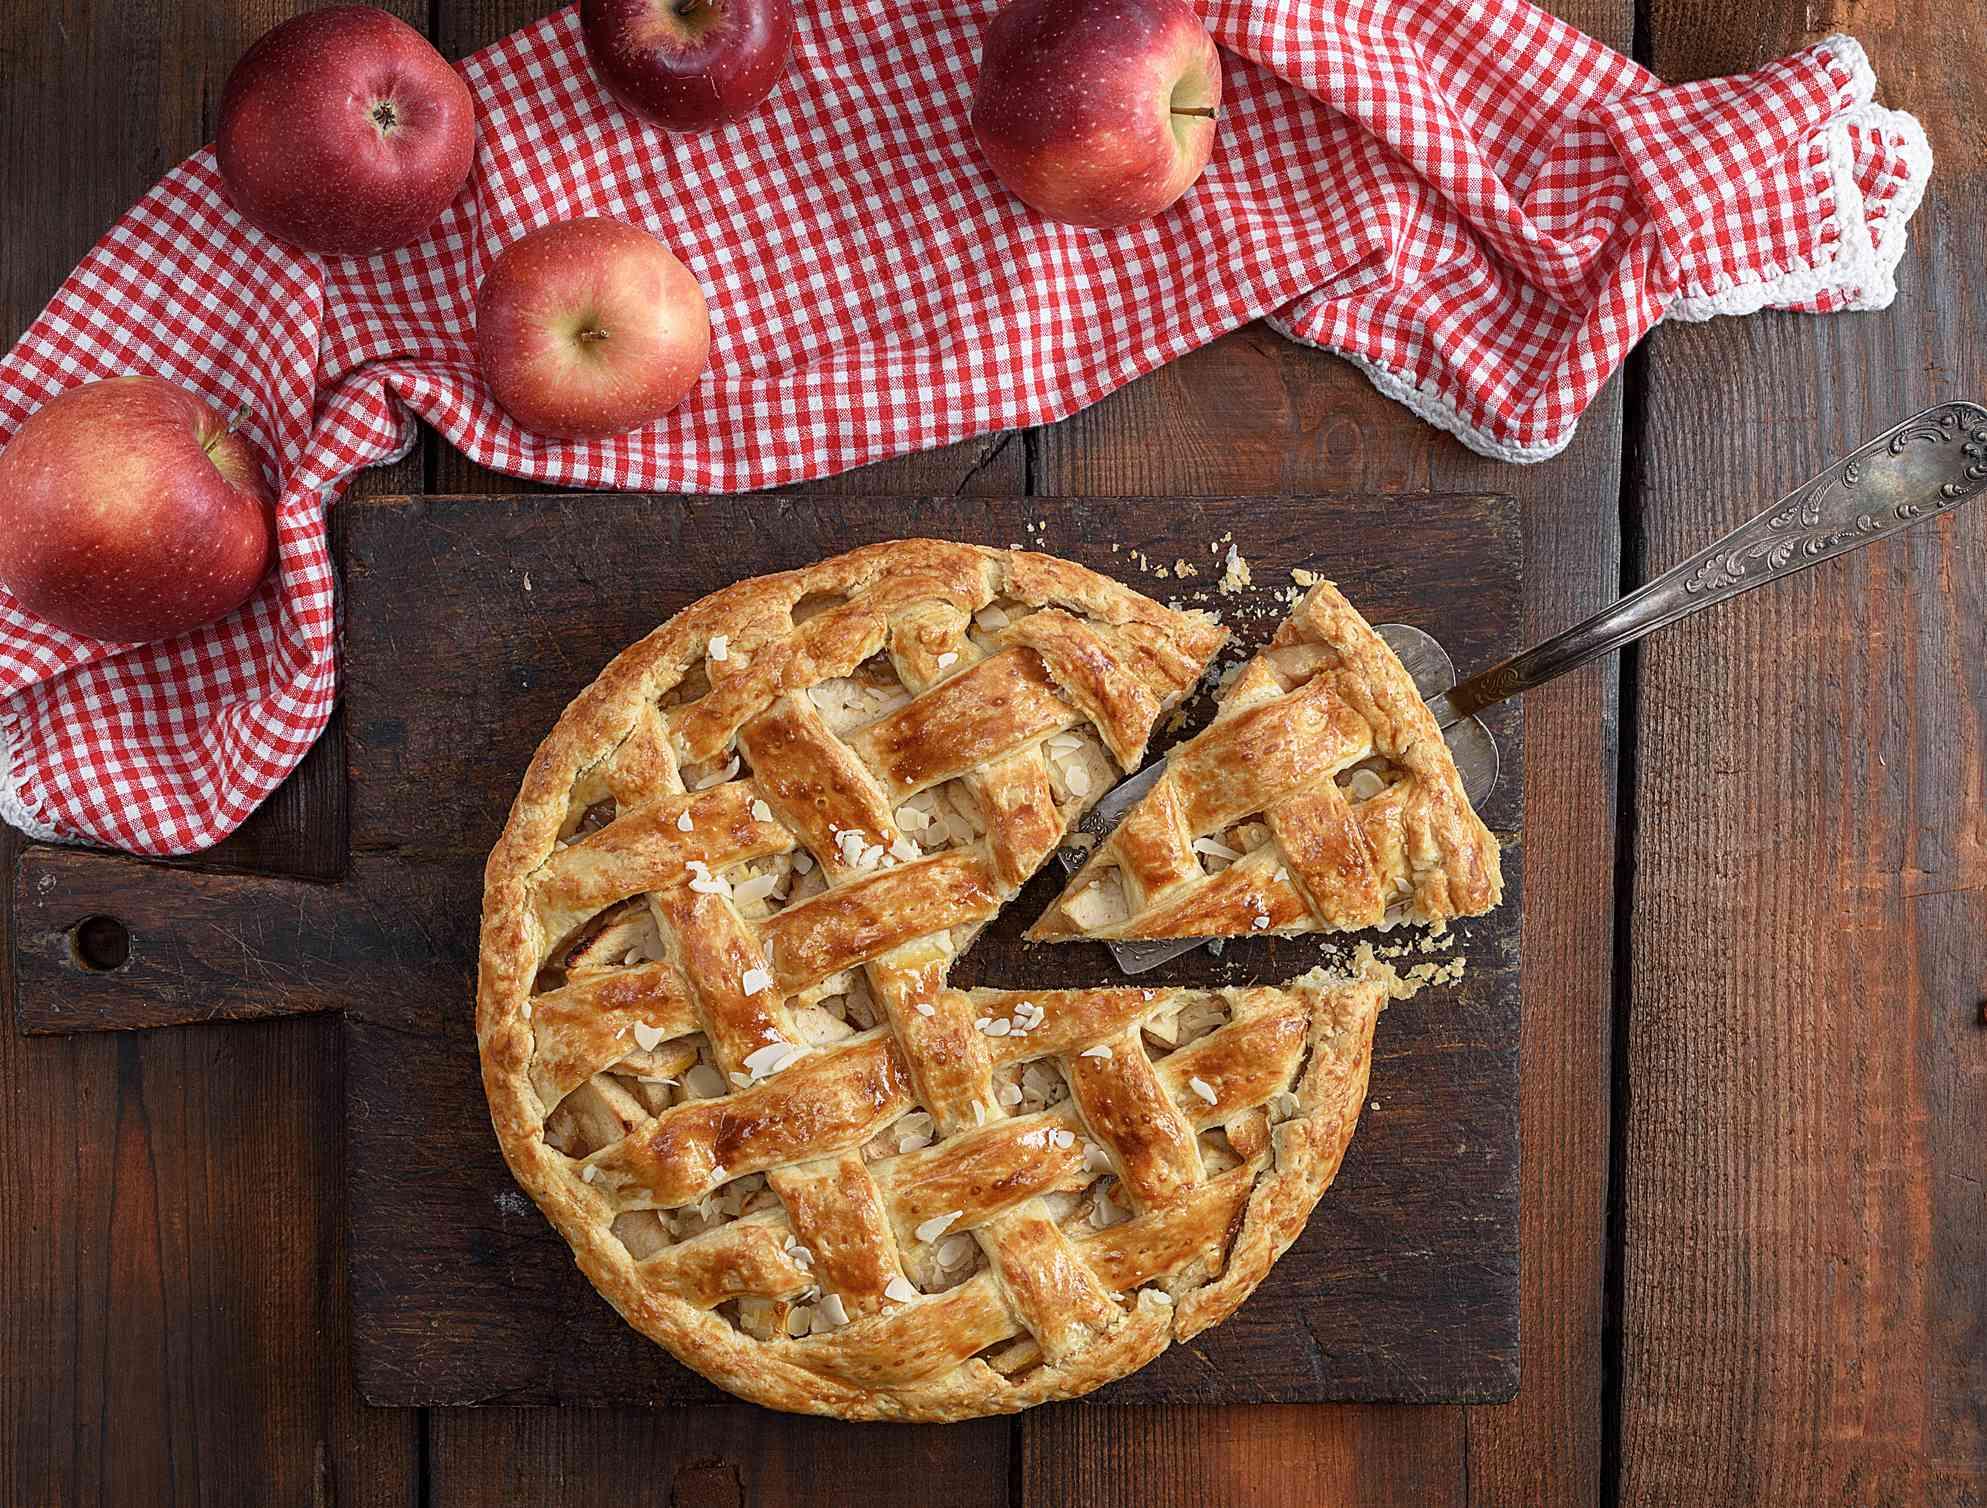 Pie Delivery Service